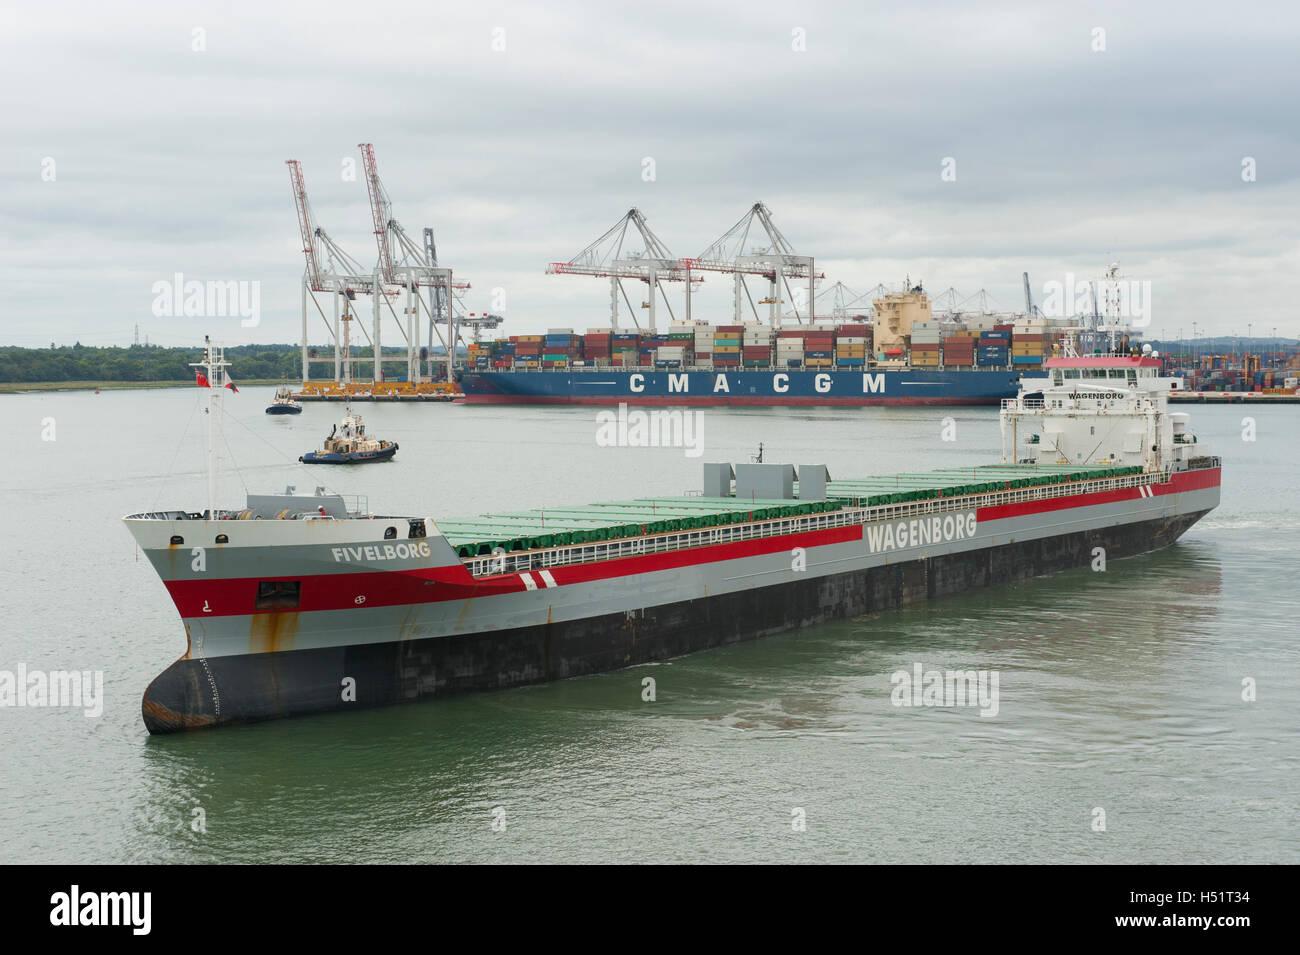 Dutch general cargo ship 'Fivelborg' leaving Southampton docks - Stock Image